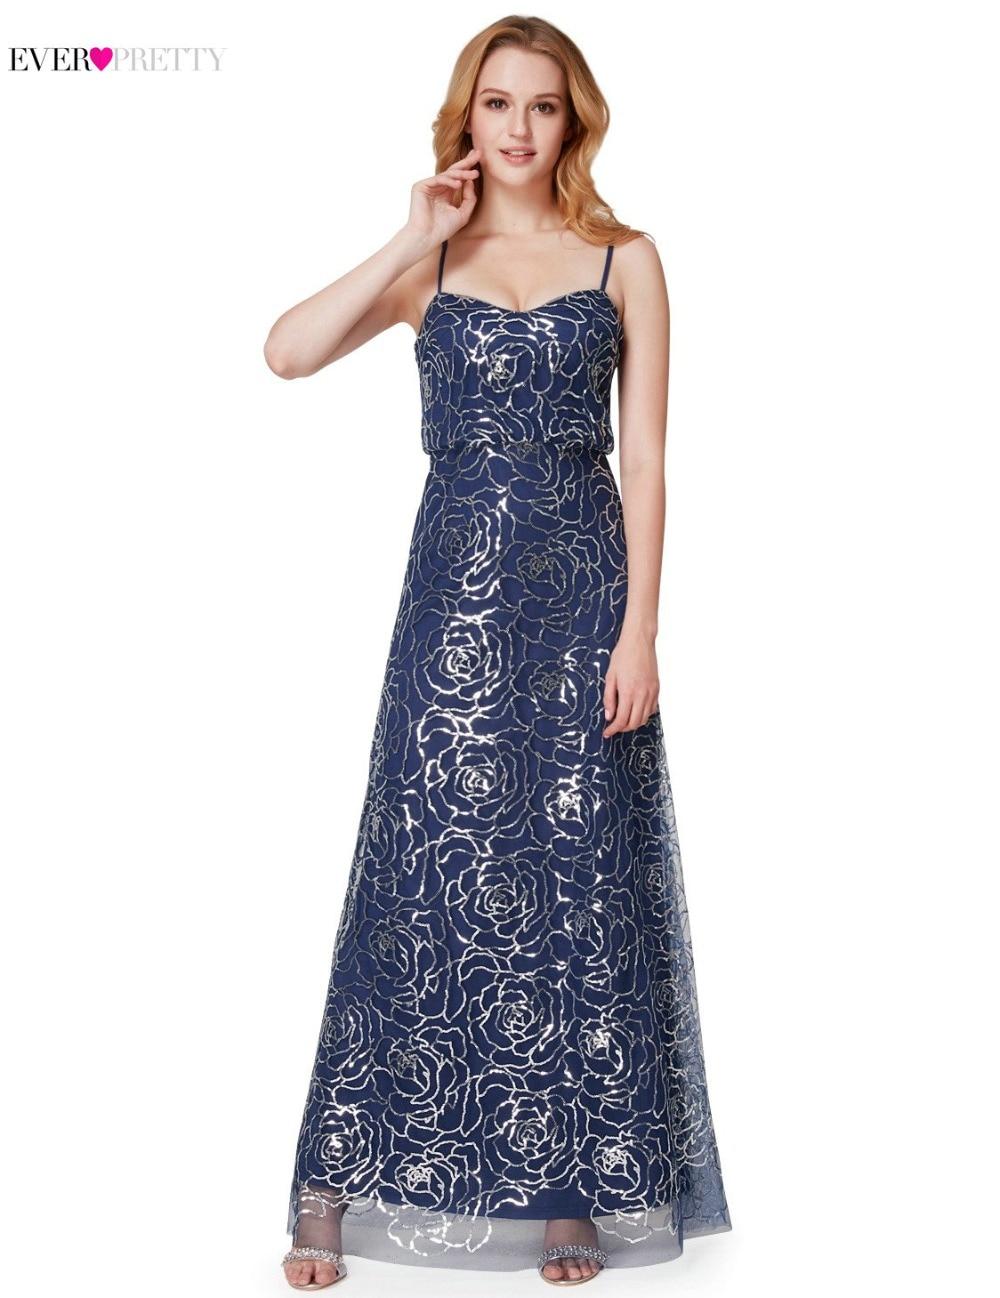 Ever Pretty New Arrival Sparkly Lentejuelas Prom Vestidos Maxys Girls - Vestidos para ocasiones especiales